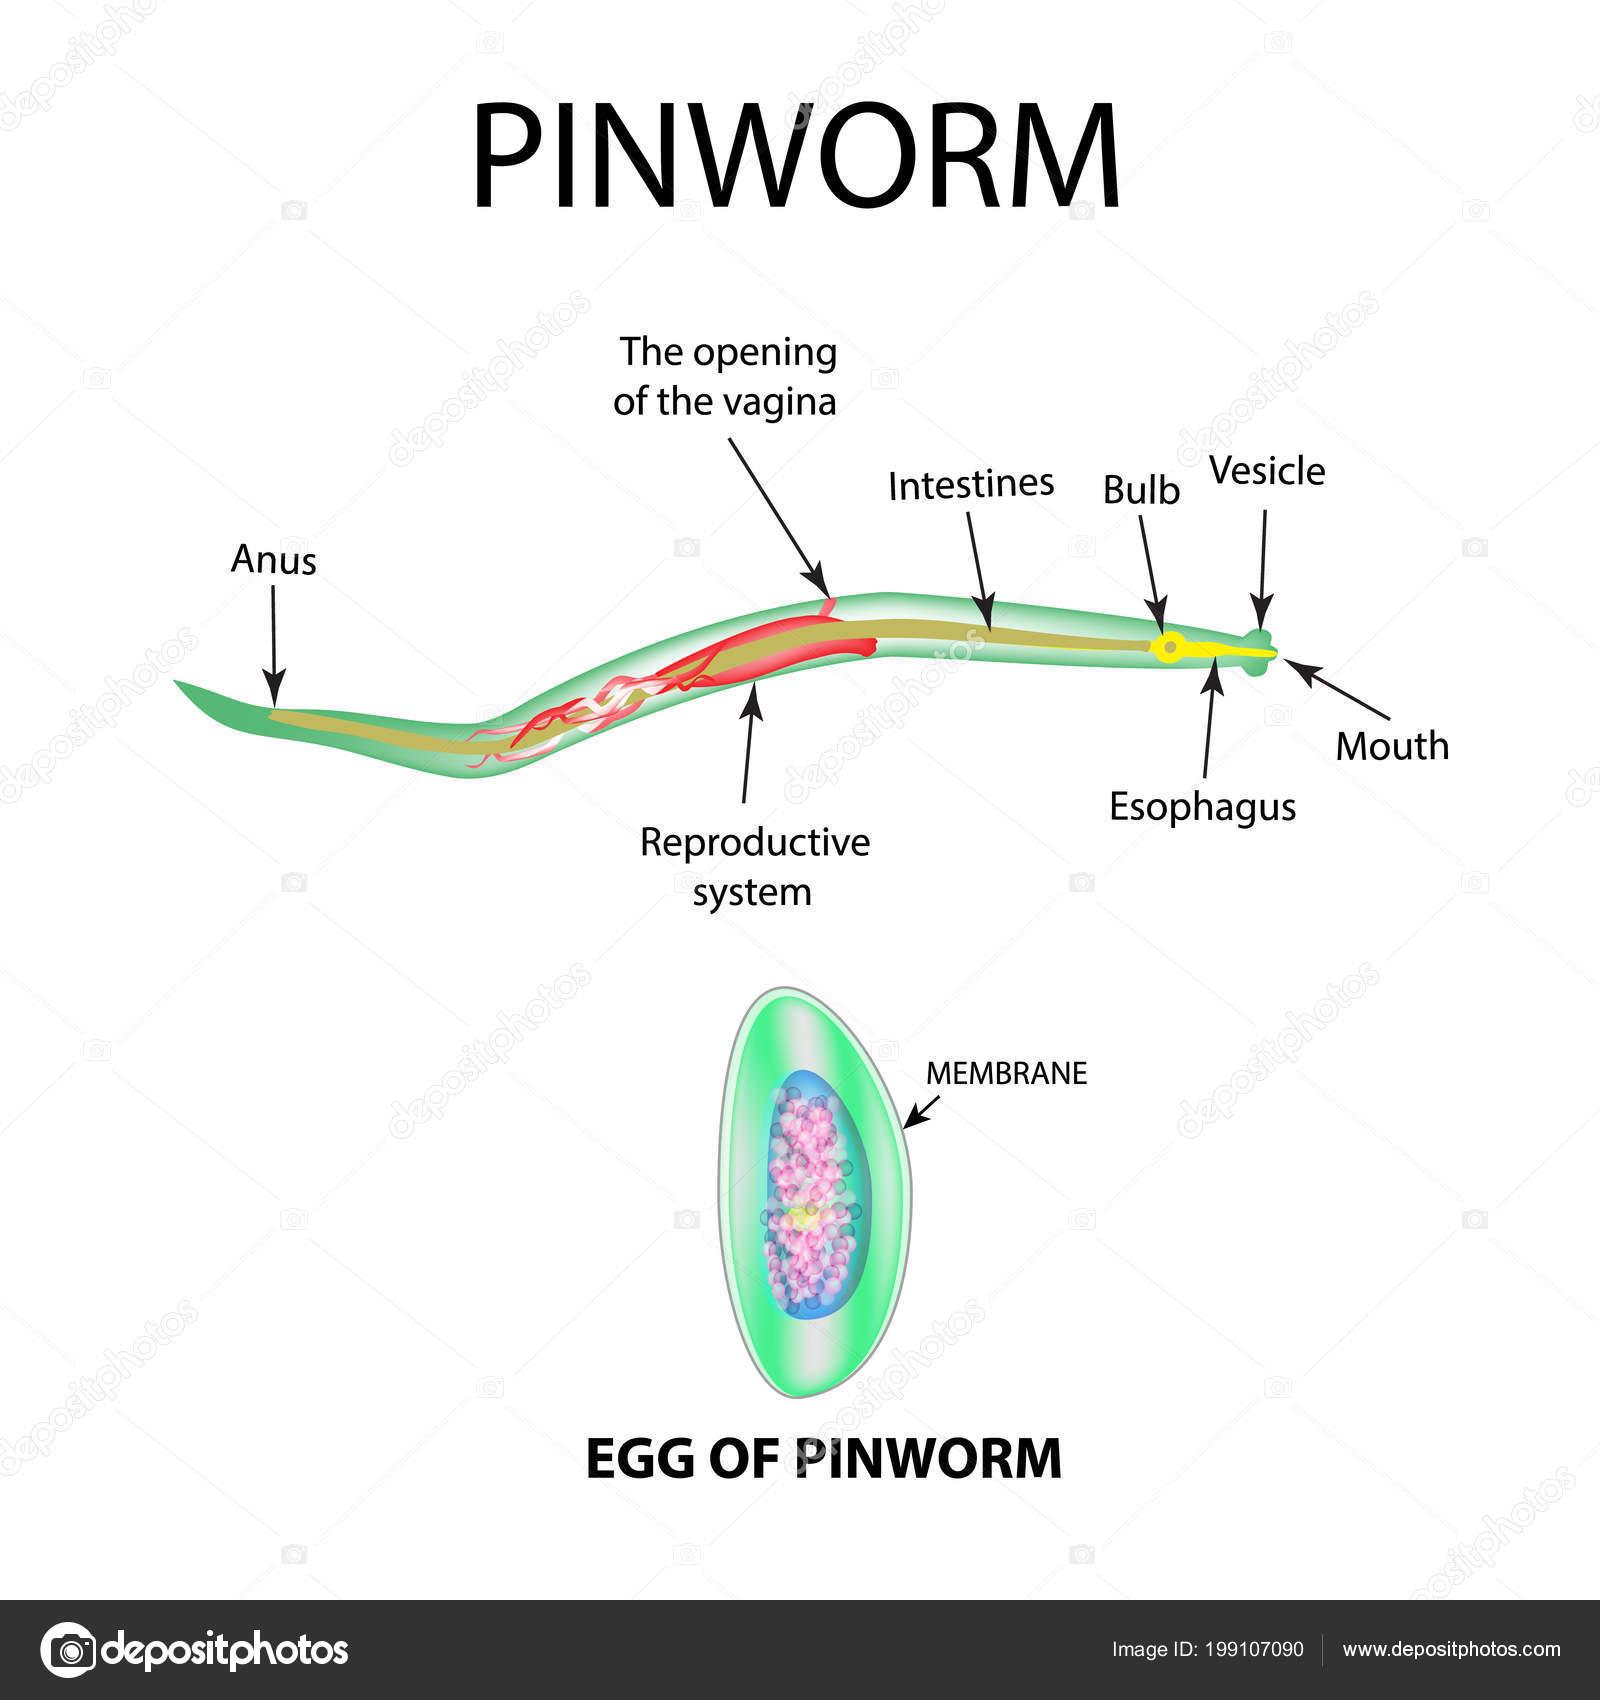 felnőtt pinwormok